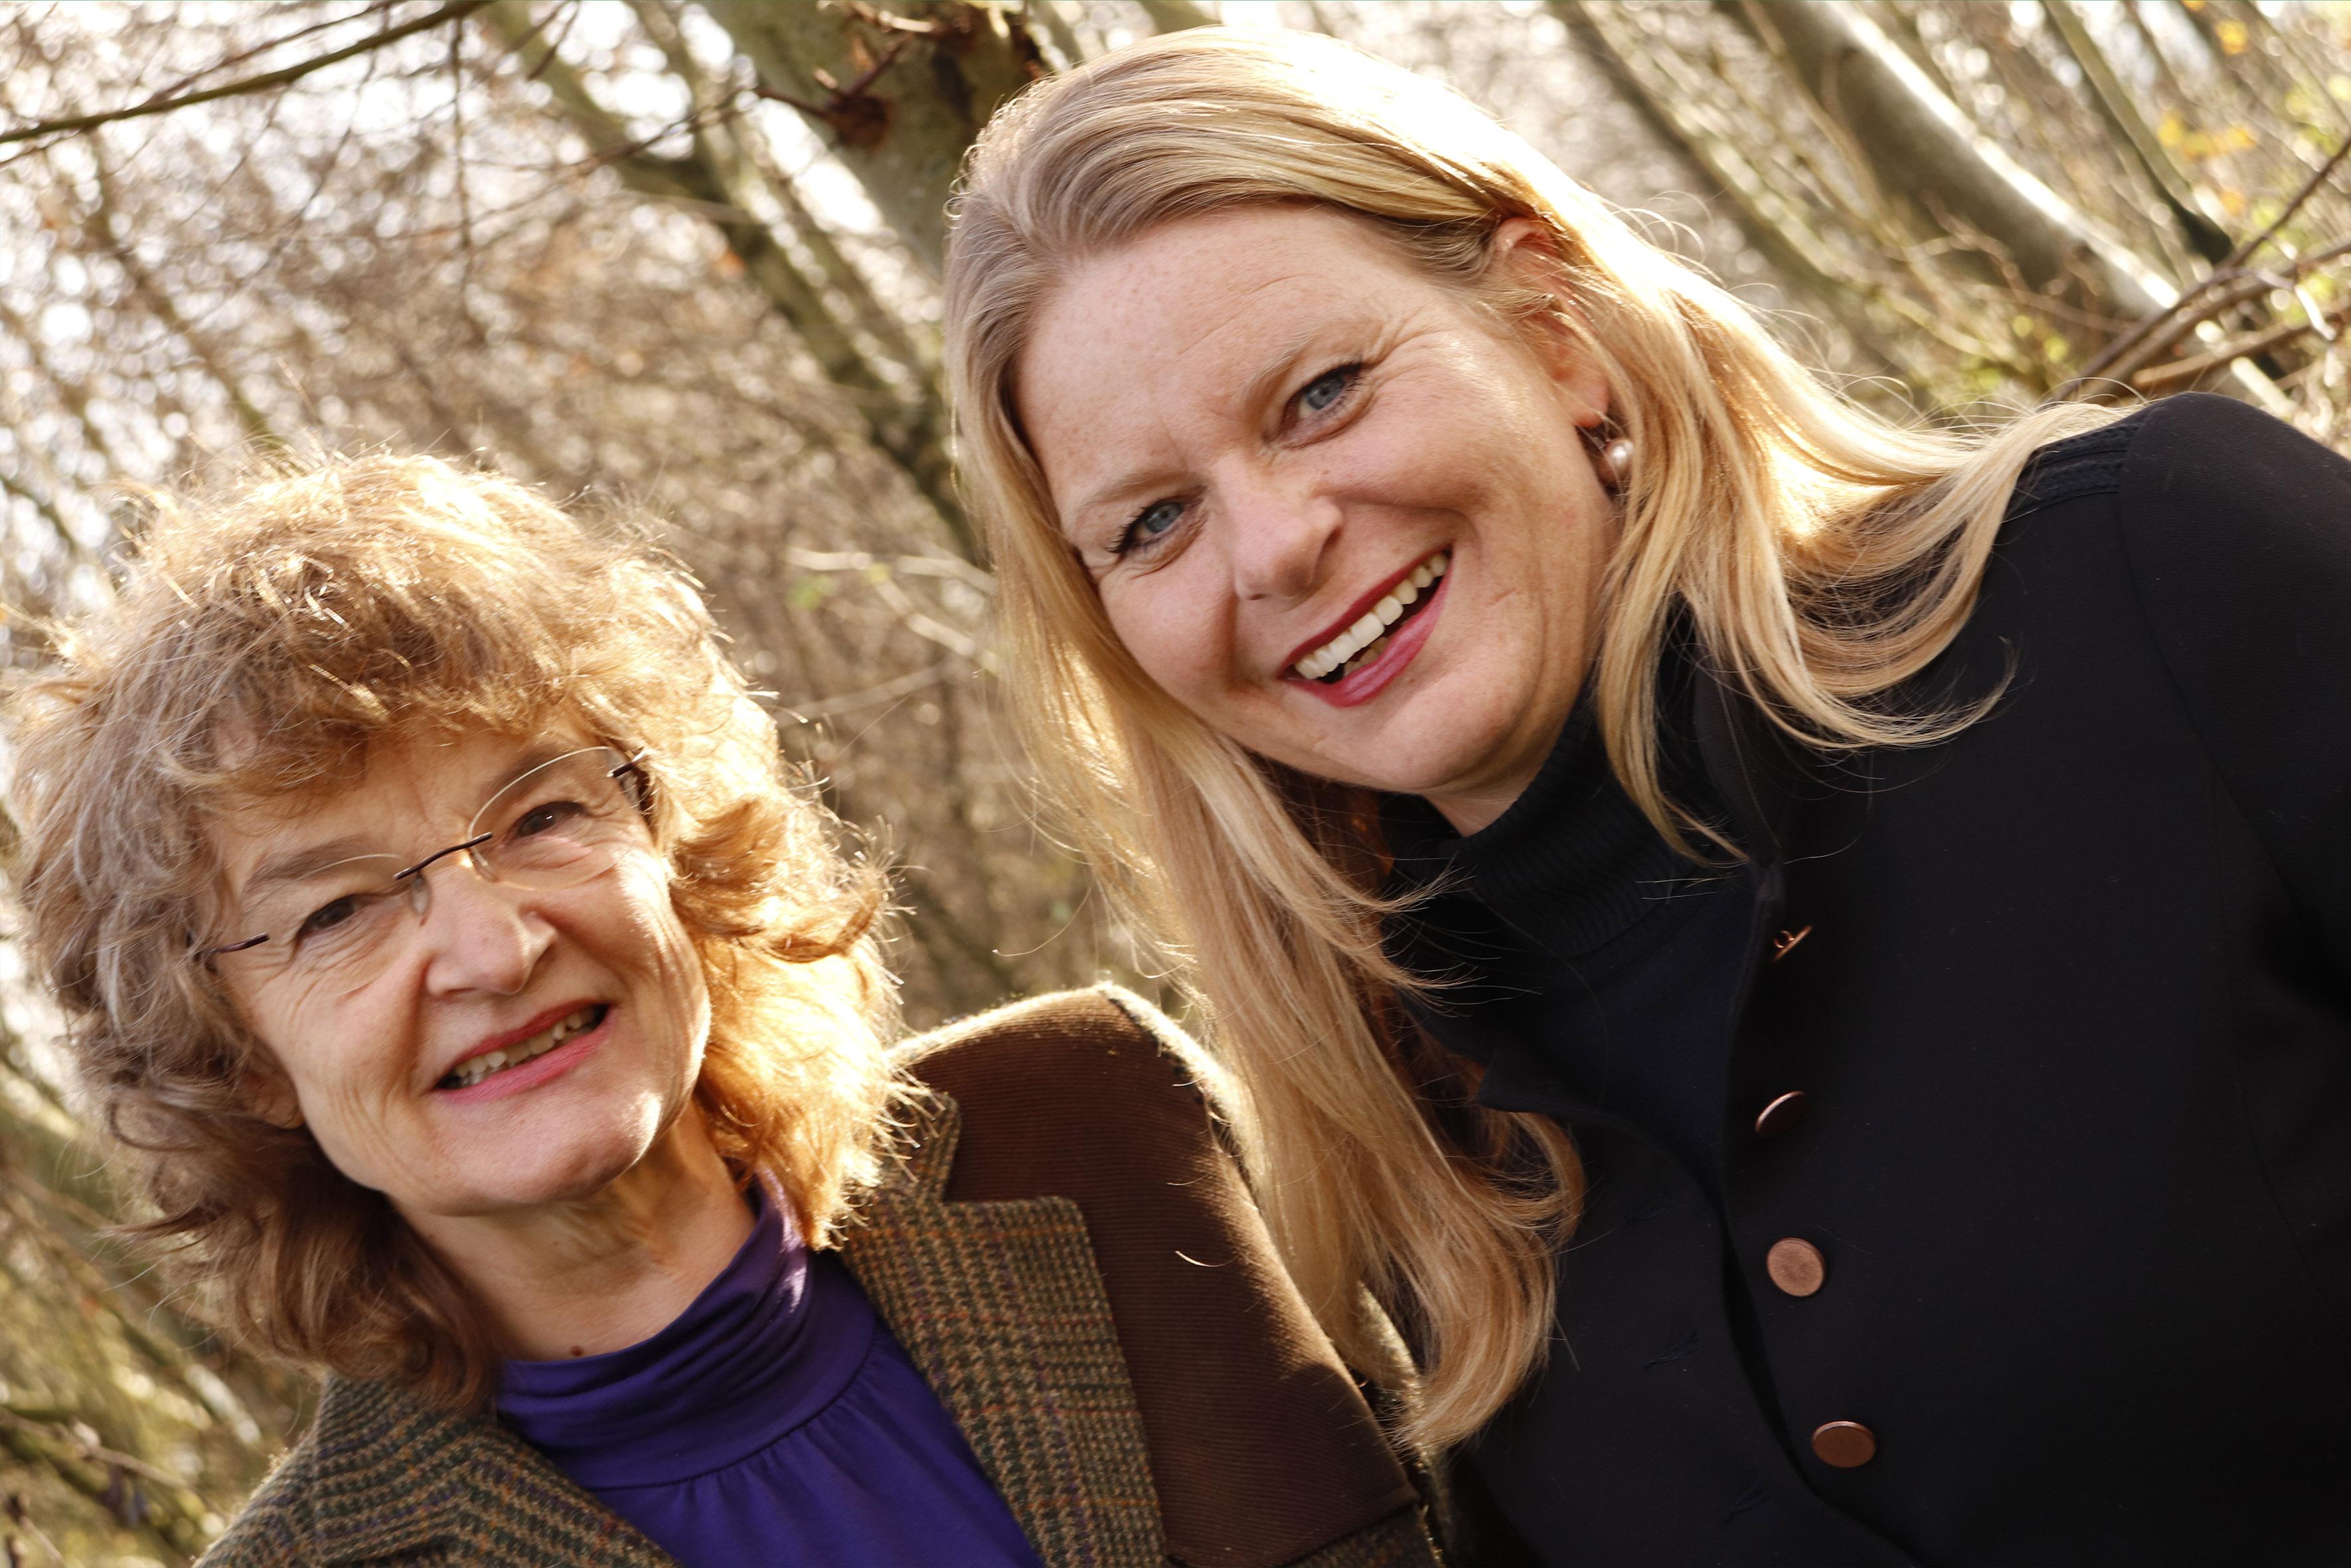 Karin van der Gaast & Saskia Borgers